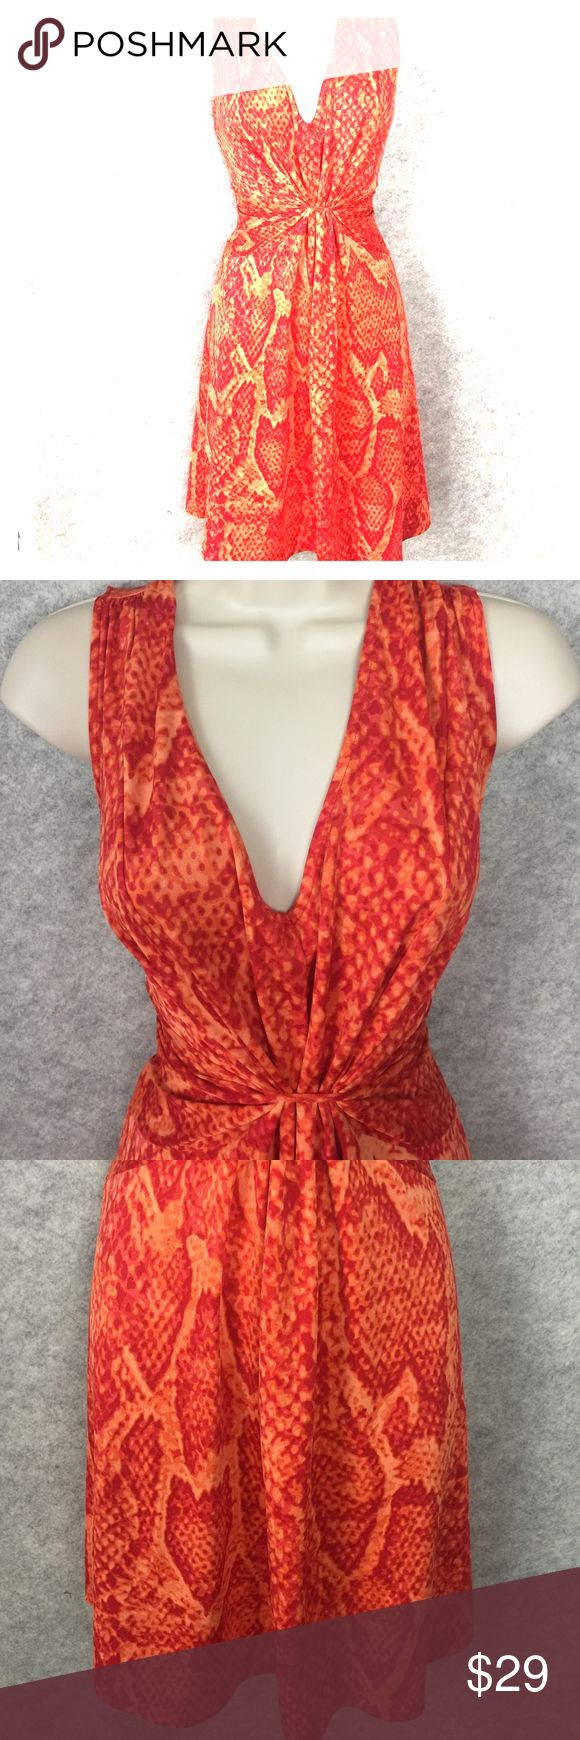 "XS SEXY Sofia Vergara CINCH SNAKESKIN DRESS Party Measurements laying flat  14"" chest 11.5"" waist 33"" long Sofia Vergara Dresses Midi"